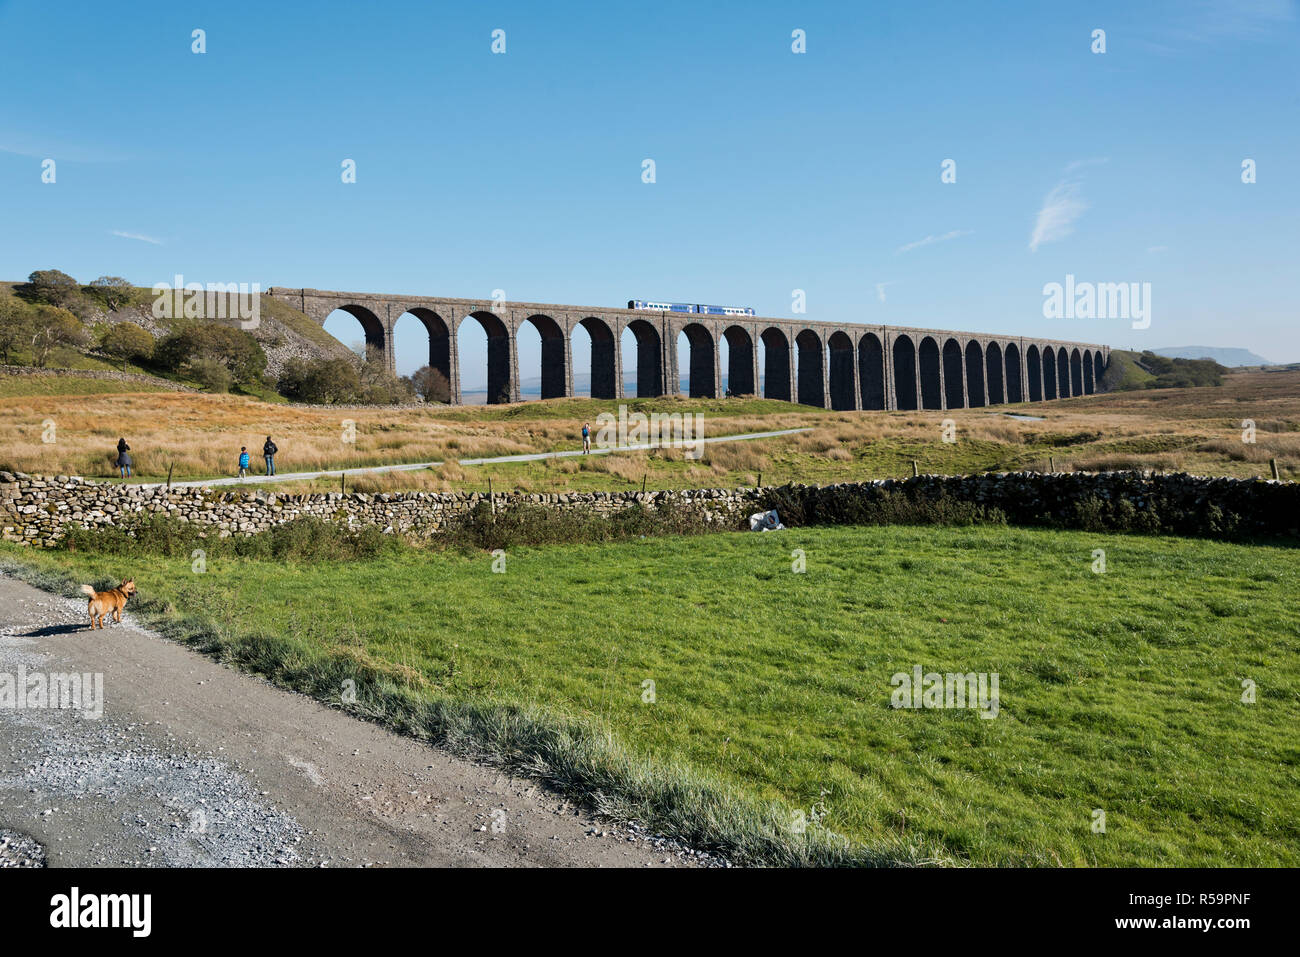 A Sprinter passenger train crosses Ribblehead Viaduct, near Ingleton, Yorkshire Dales National Park, UK - Stock Image